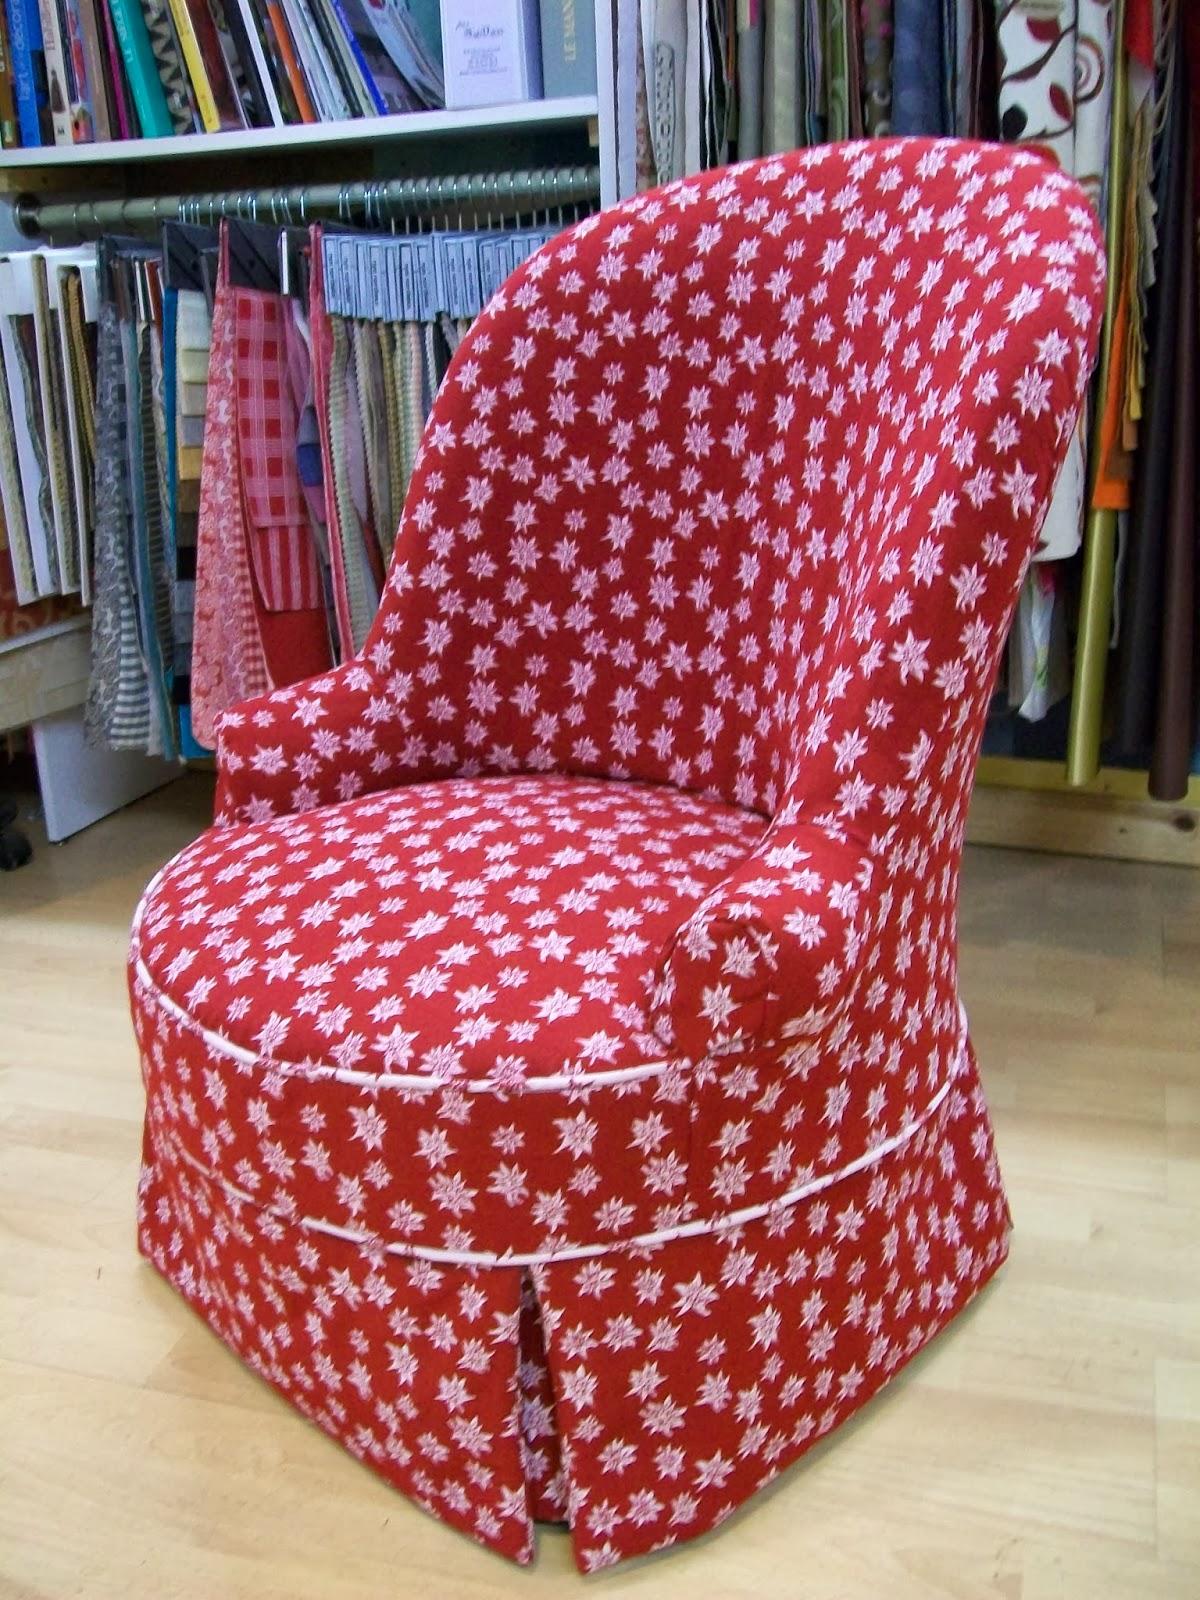 L 39 housse sur fauteuil chauffeuse crapaud for Housse fauteuil crapaud